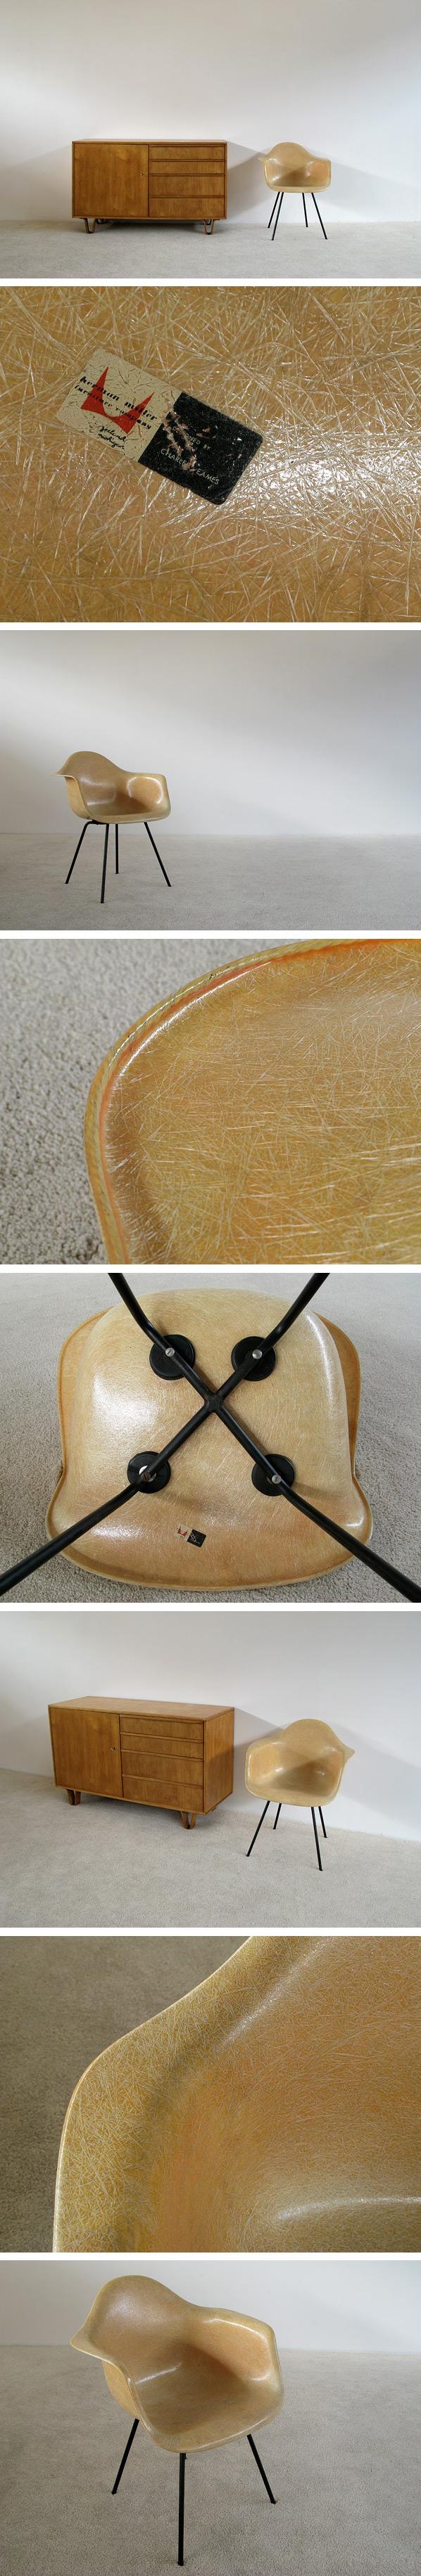 Charles Eames Zenith Herman Miller Rope Edge DAX fiberglass chair Large